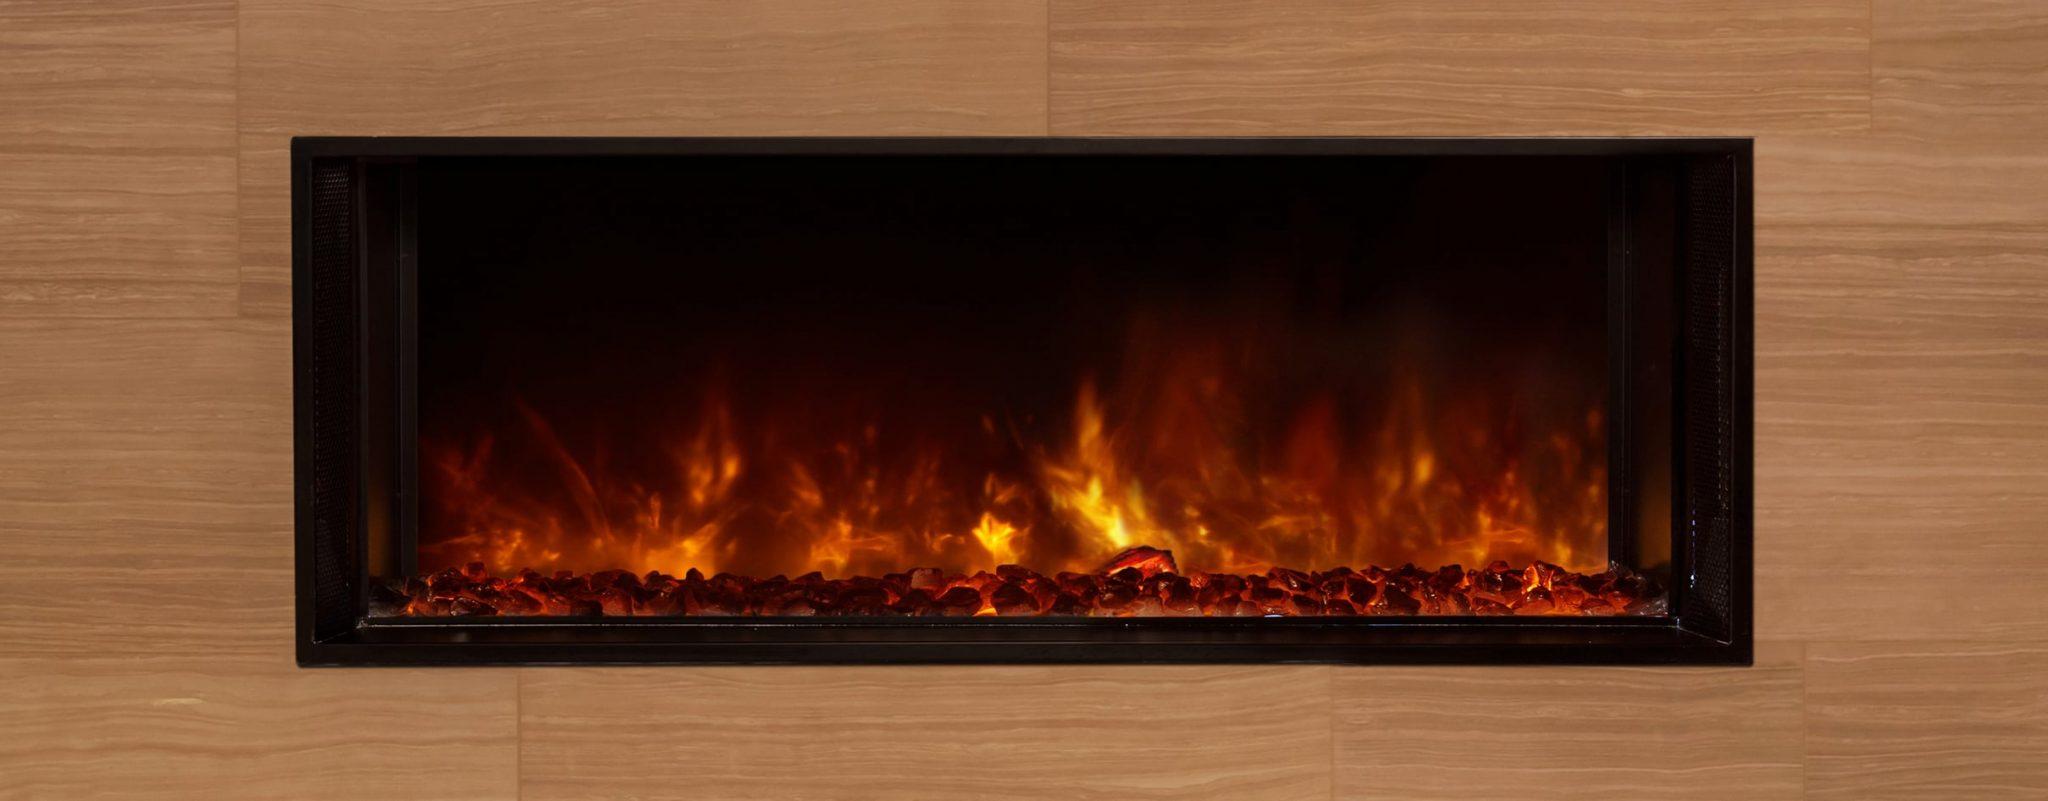 Fireplace_LFV40